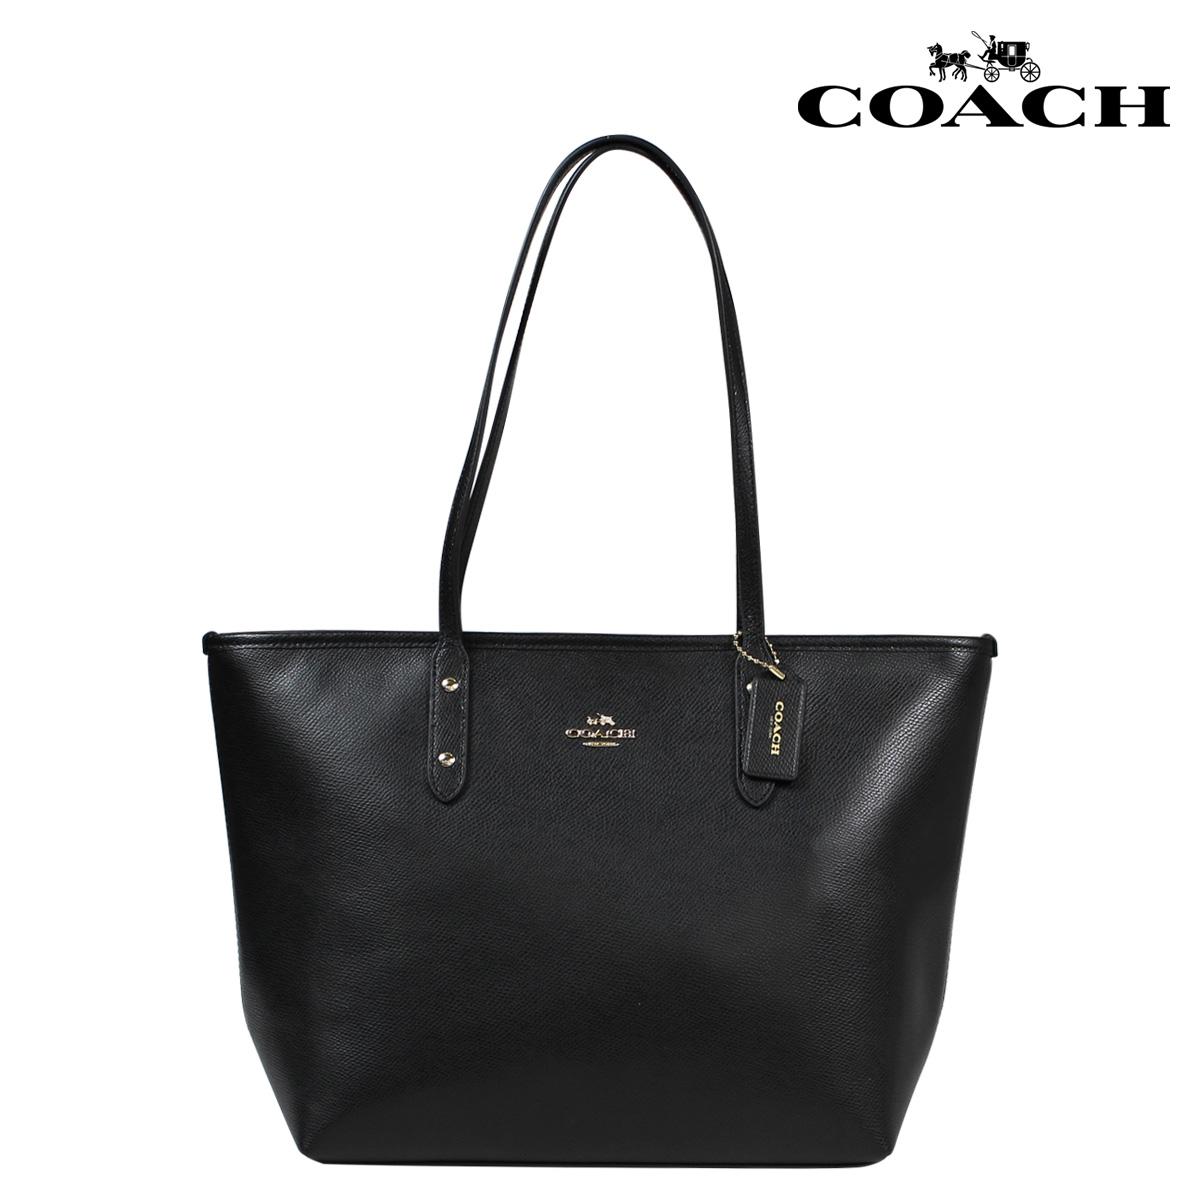 6d9aae5b61db5 Whats up Sports  COACH coach bag tote bag F36875 black women s ...